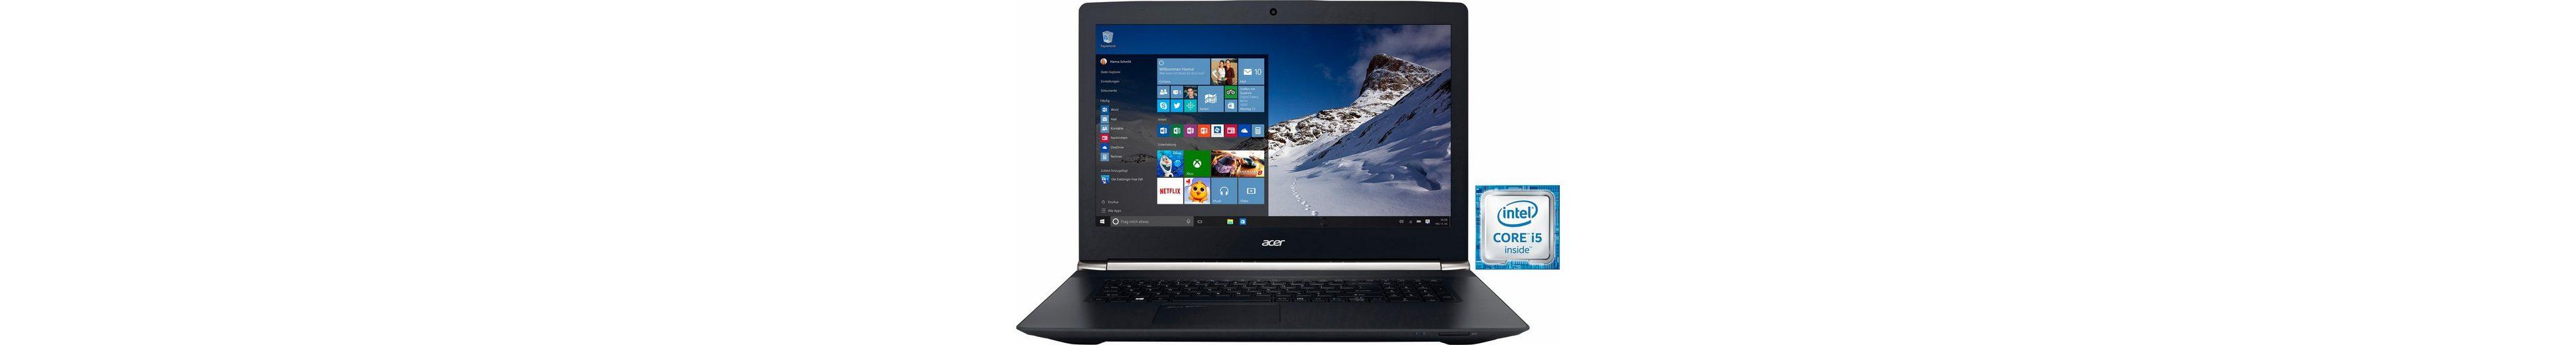 Acer Aspire V 17 Nitro VN7-792G-593V Notebook, Intel® Core™ i5, 43,9 cm (17,3 Zoll)